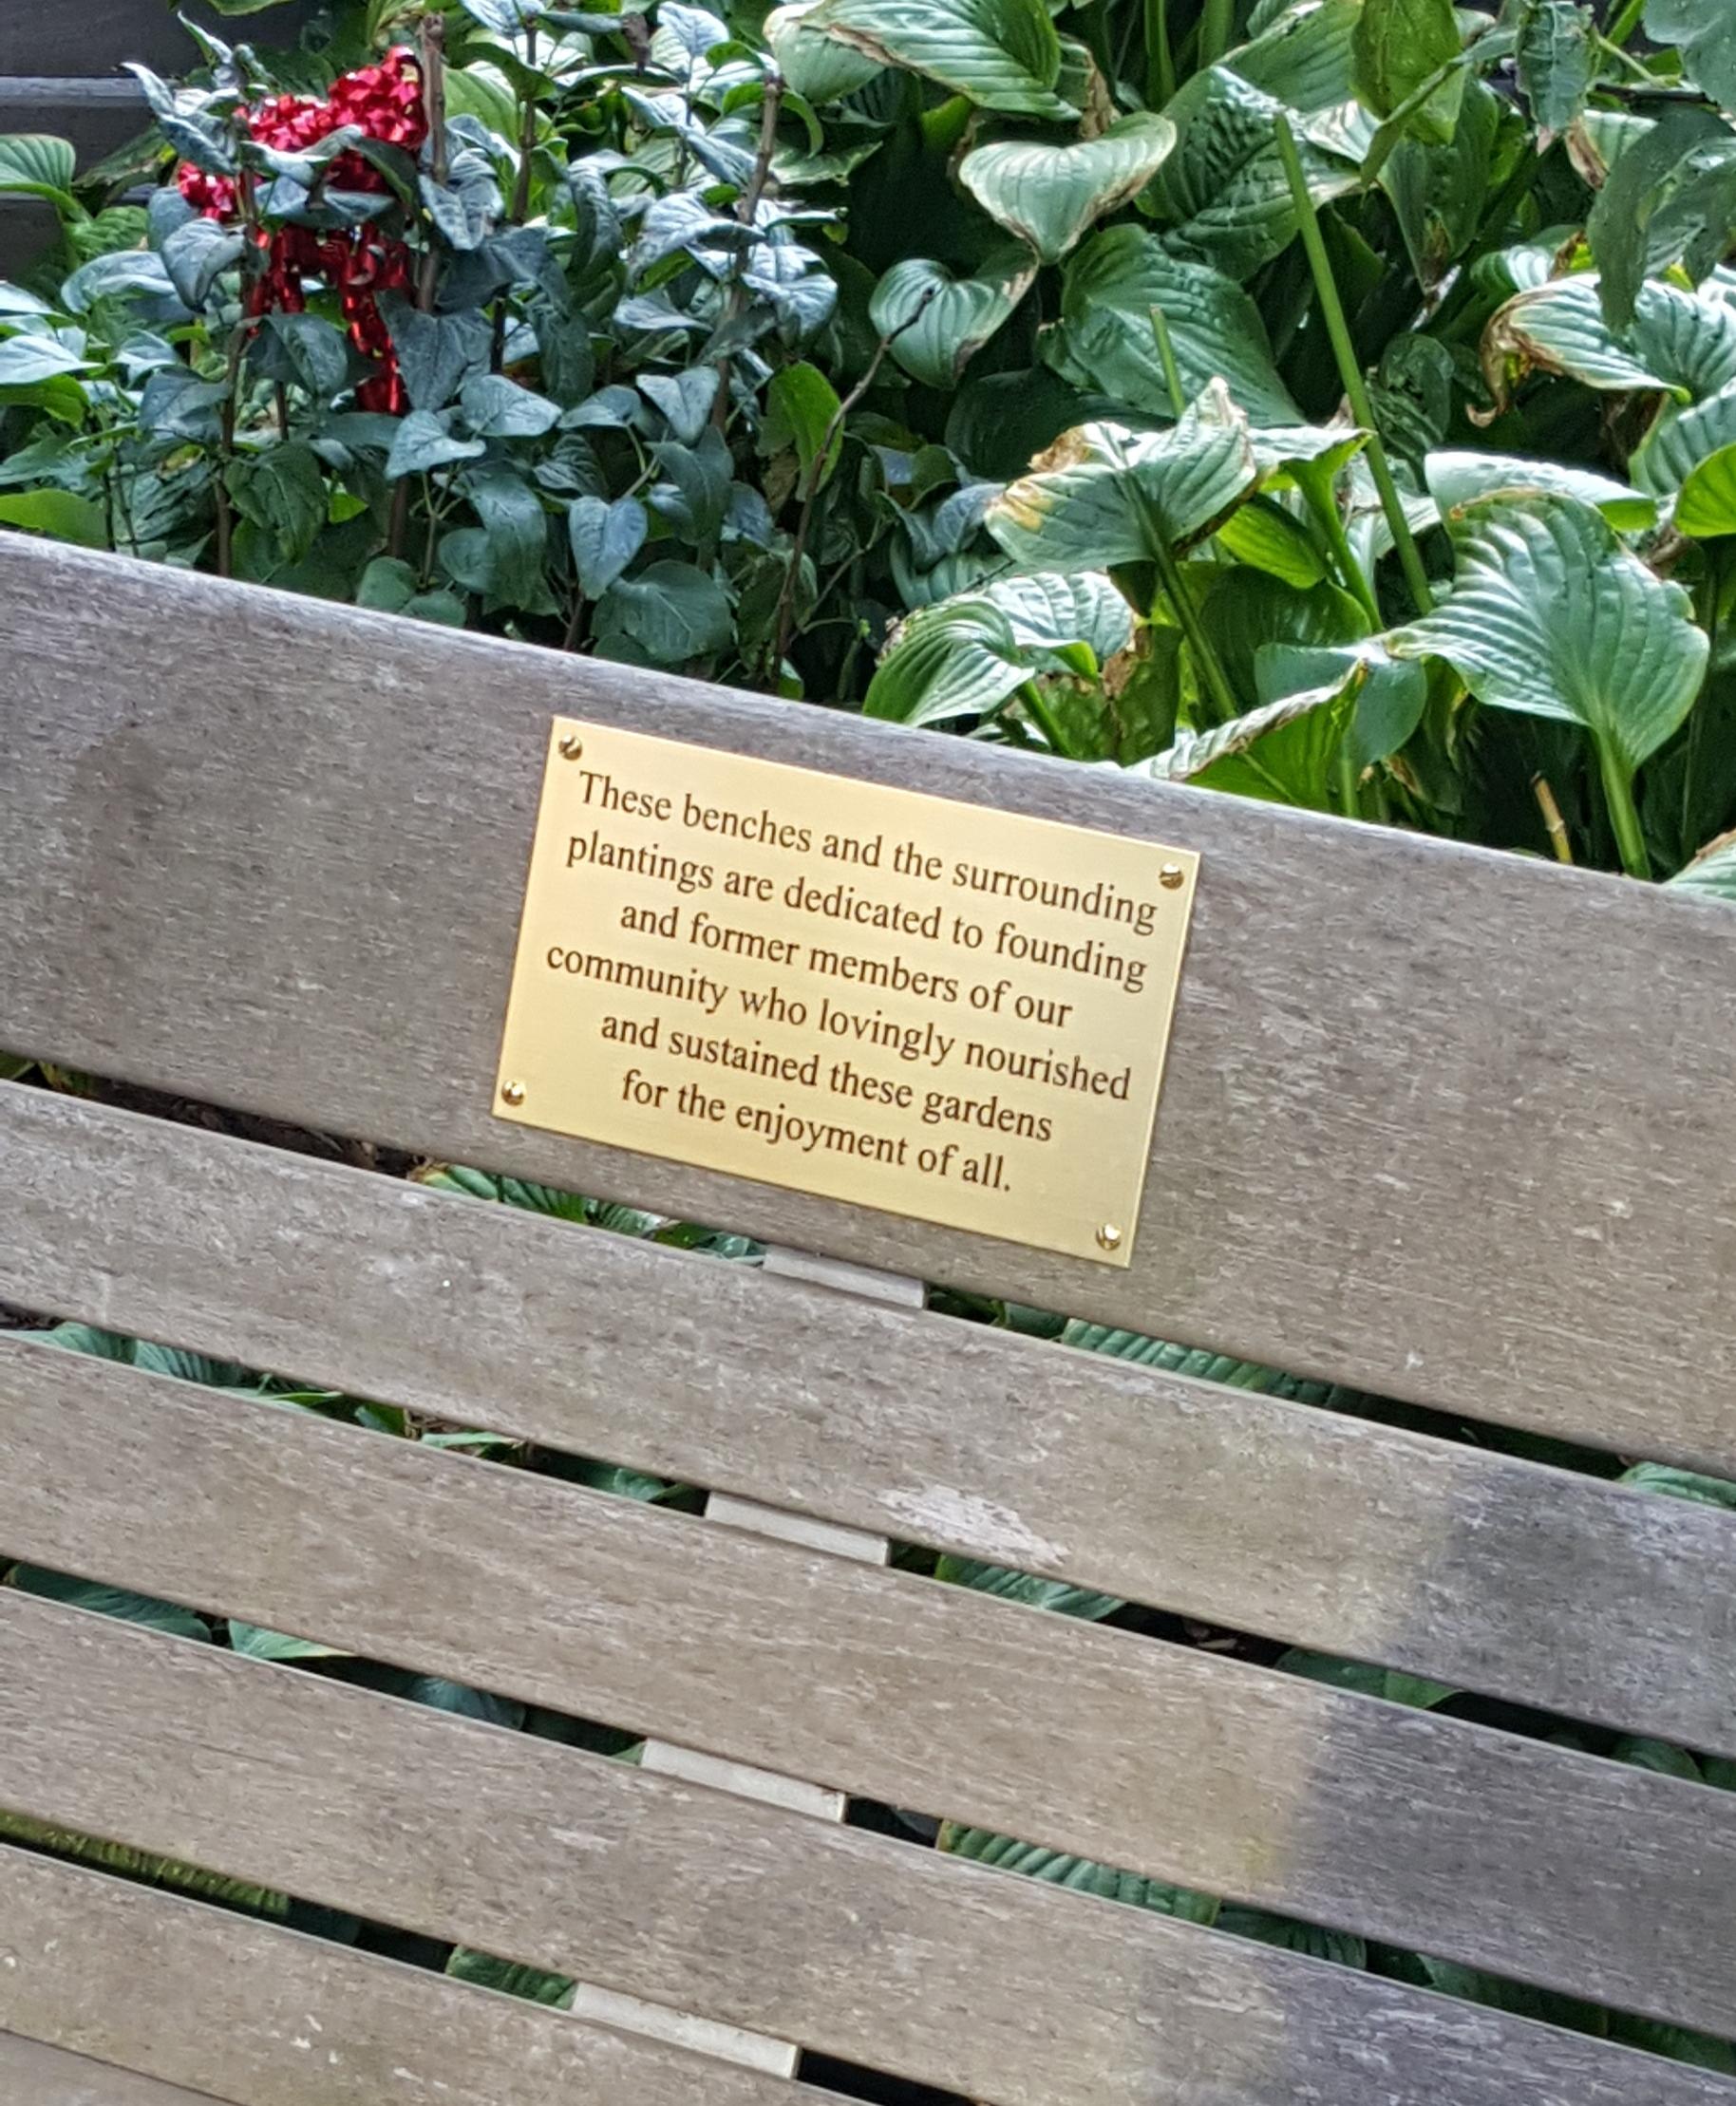 Dedication Plaque Honoring Gardeners Past and Present